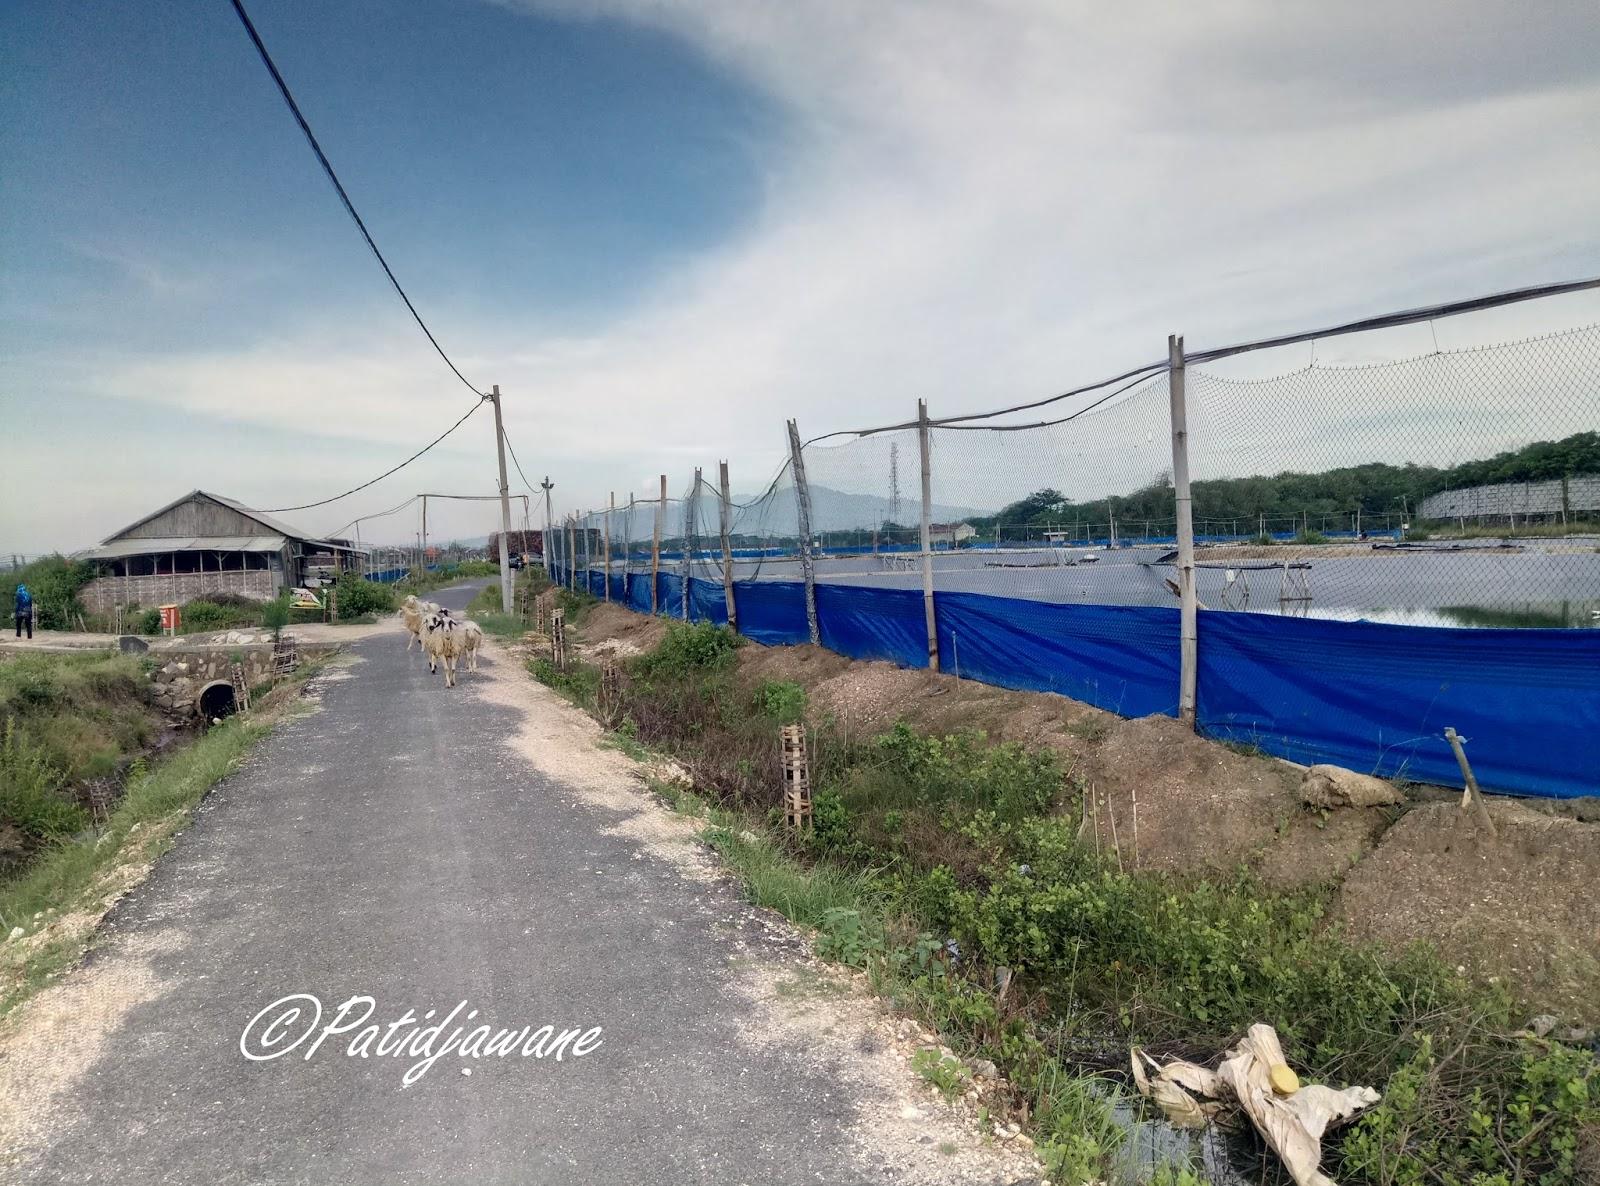 Hutan Mangrove Rembang Ketemu Kawanan Shaun Sheep Pantai Sambilawang Kab